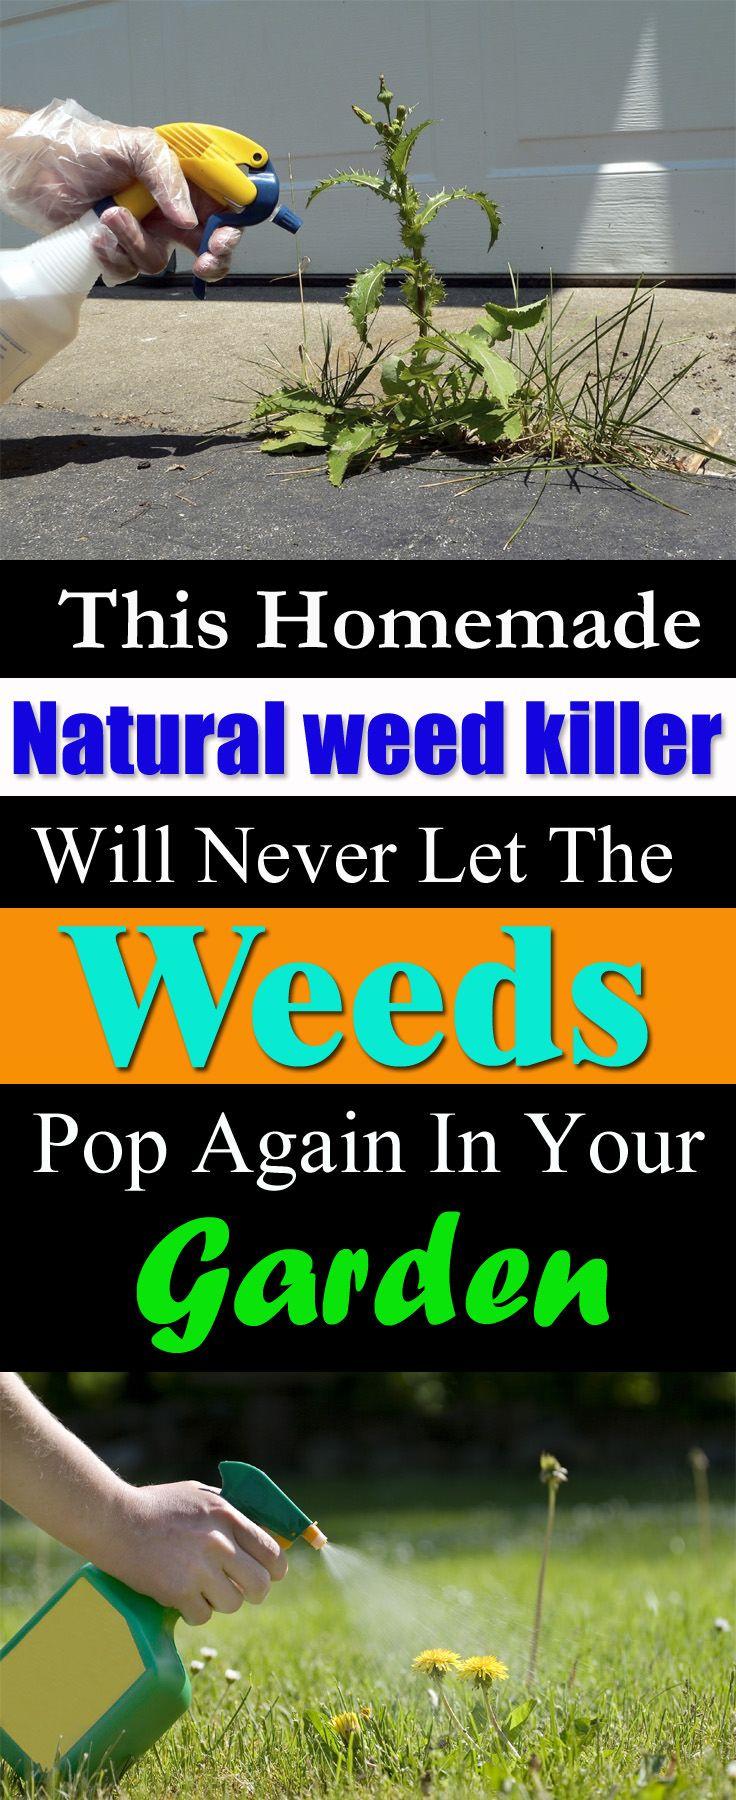 b4f40df69e39f8d6eb9ff879520fc5b1 - The Best Weed Killer For Gardens